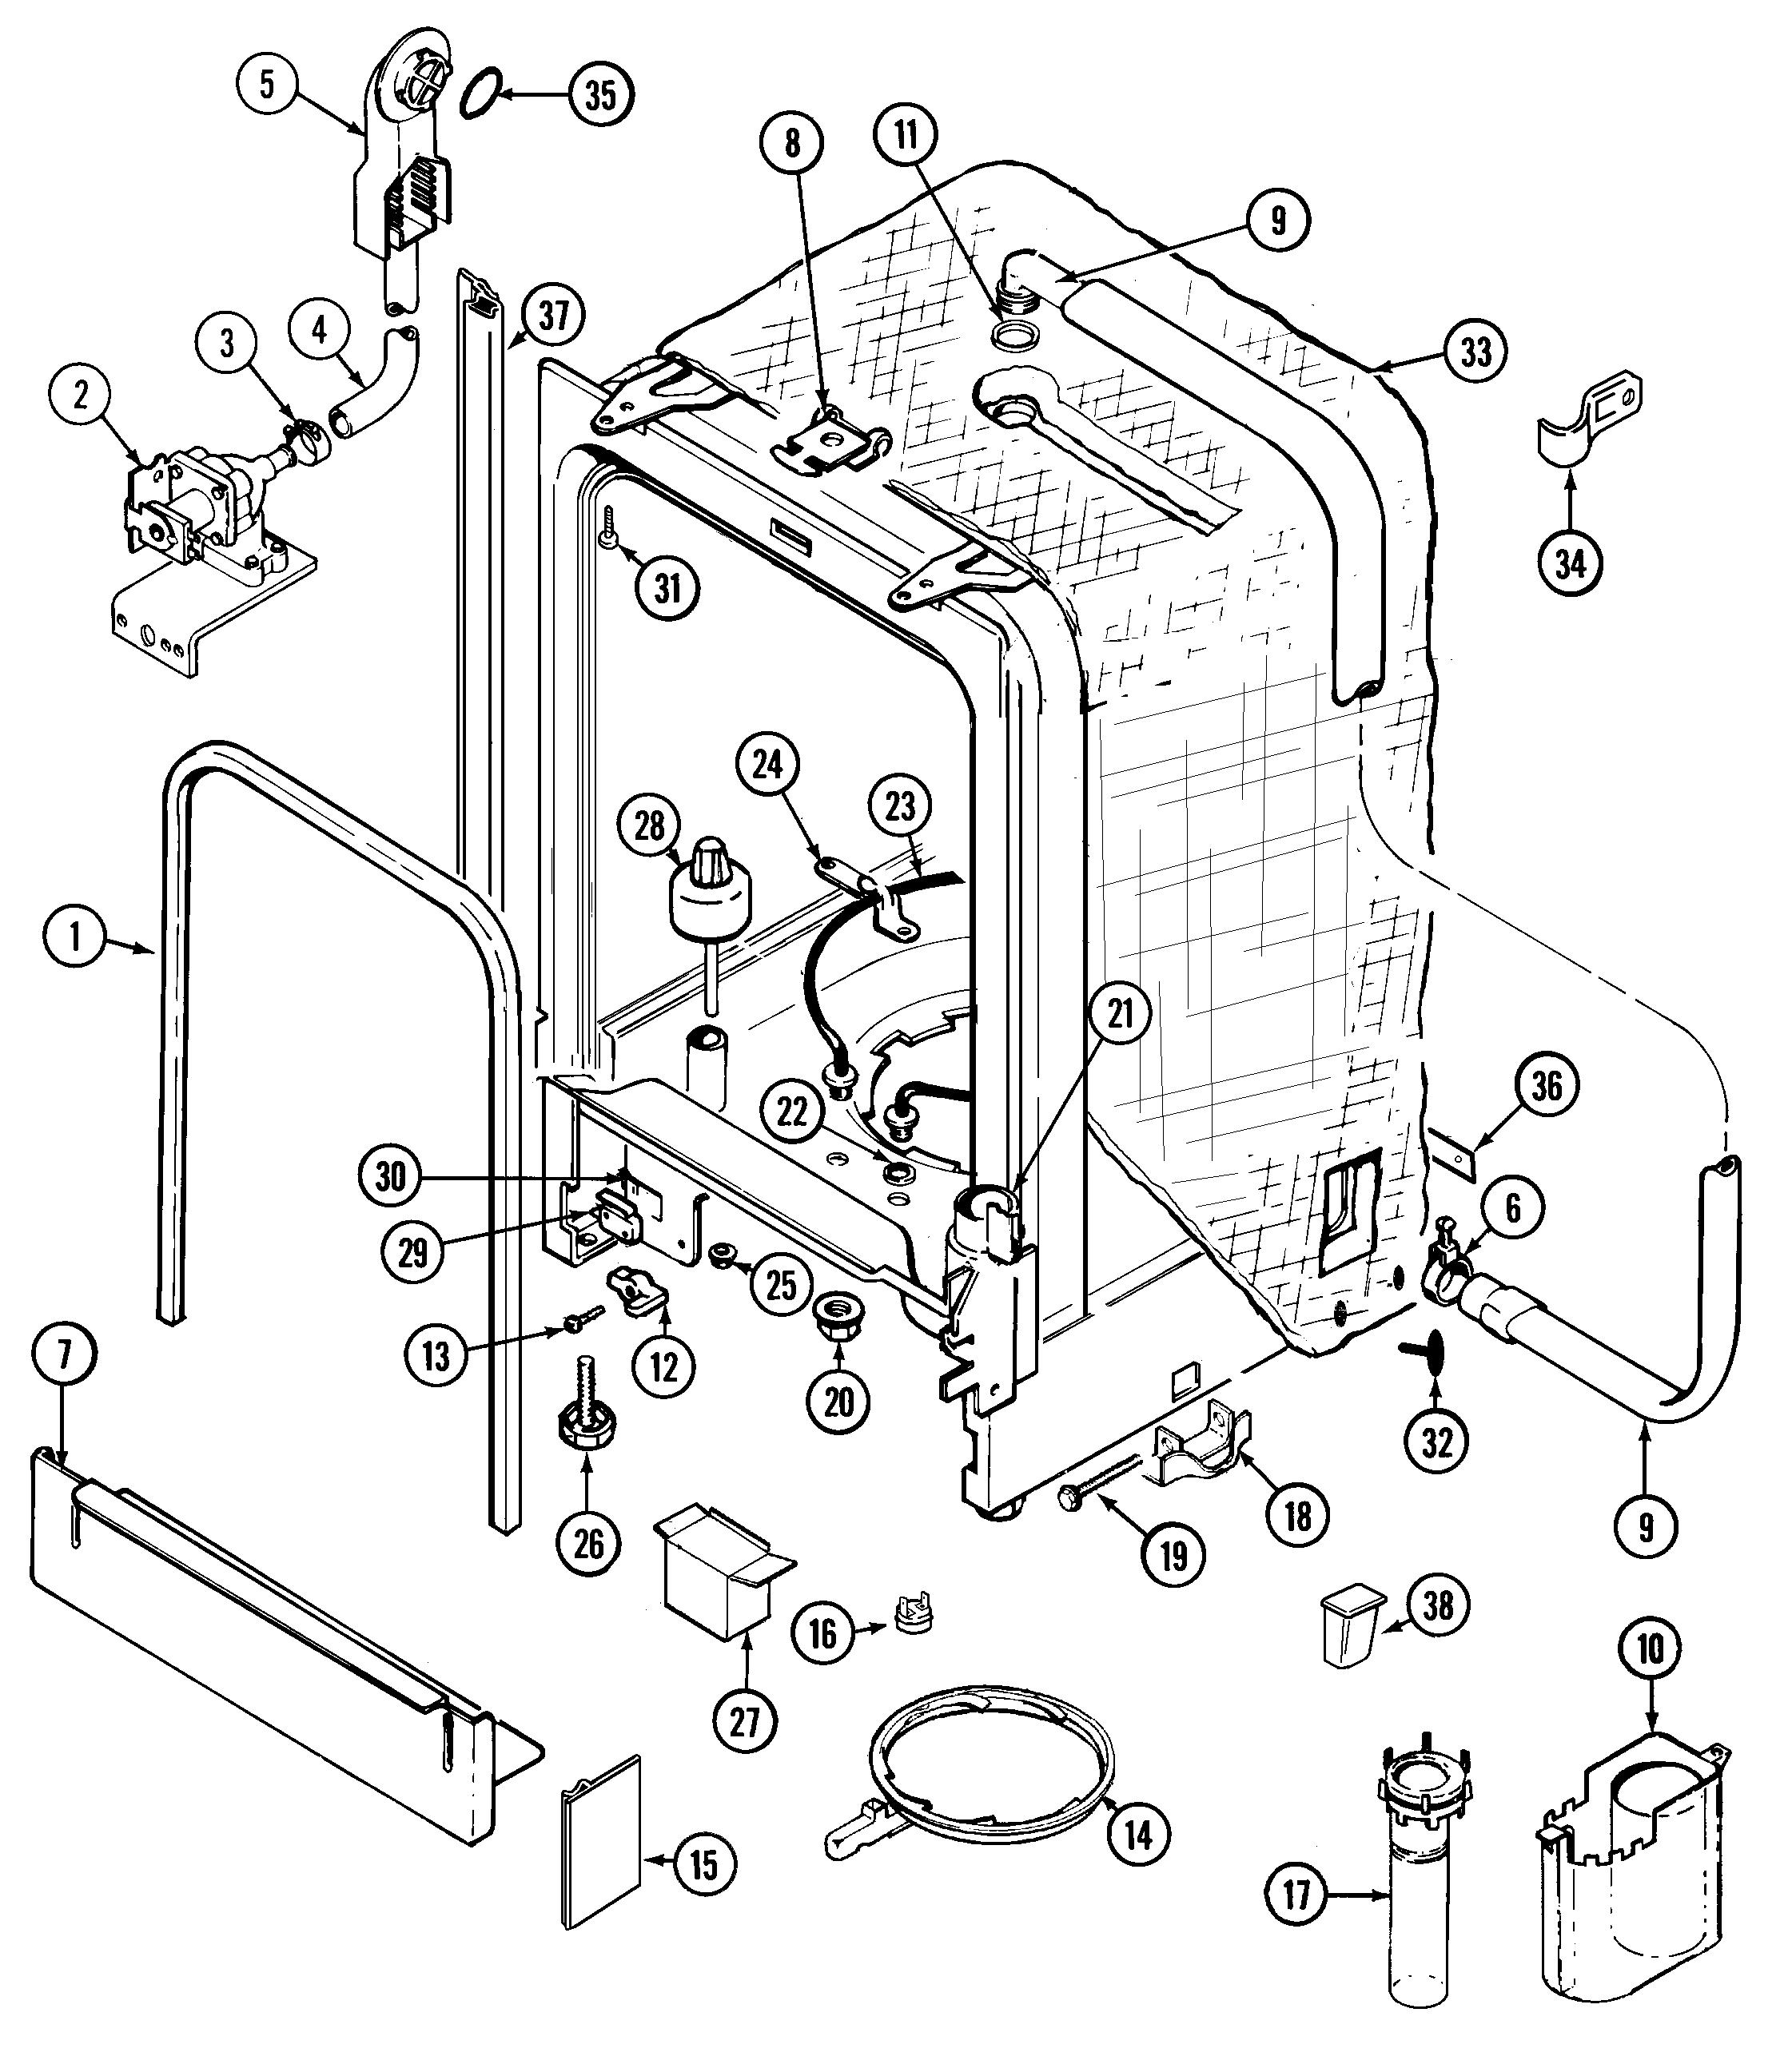 Maytag mdb6000awa timer stove clocks and appliance timers rh appliancetimers ge profile dishwasher parts diagram frigidaire dishwasher parts